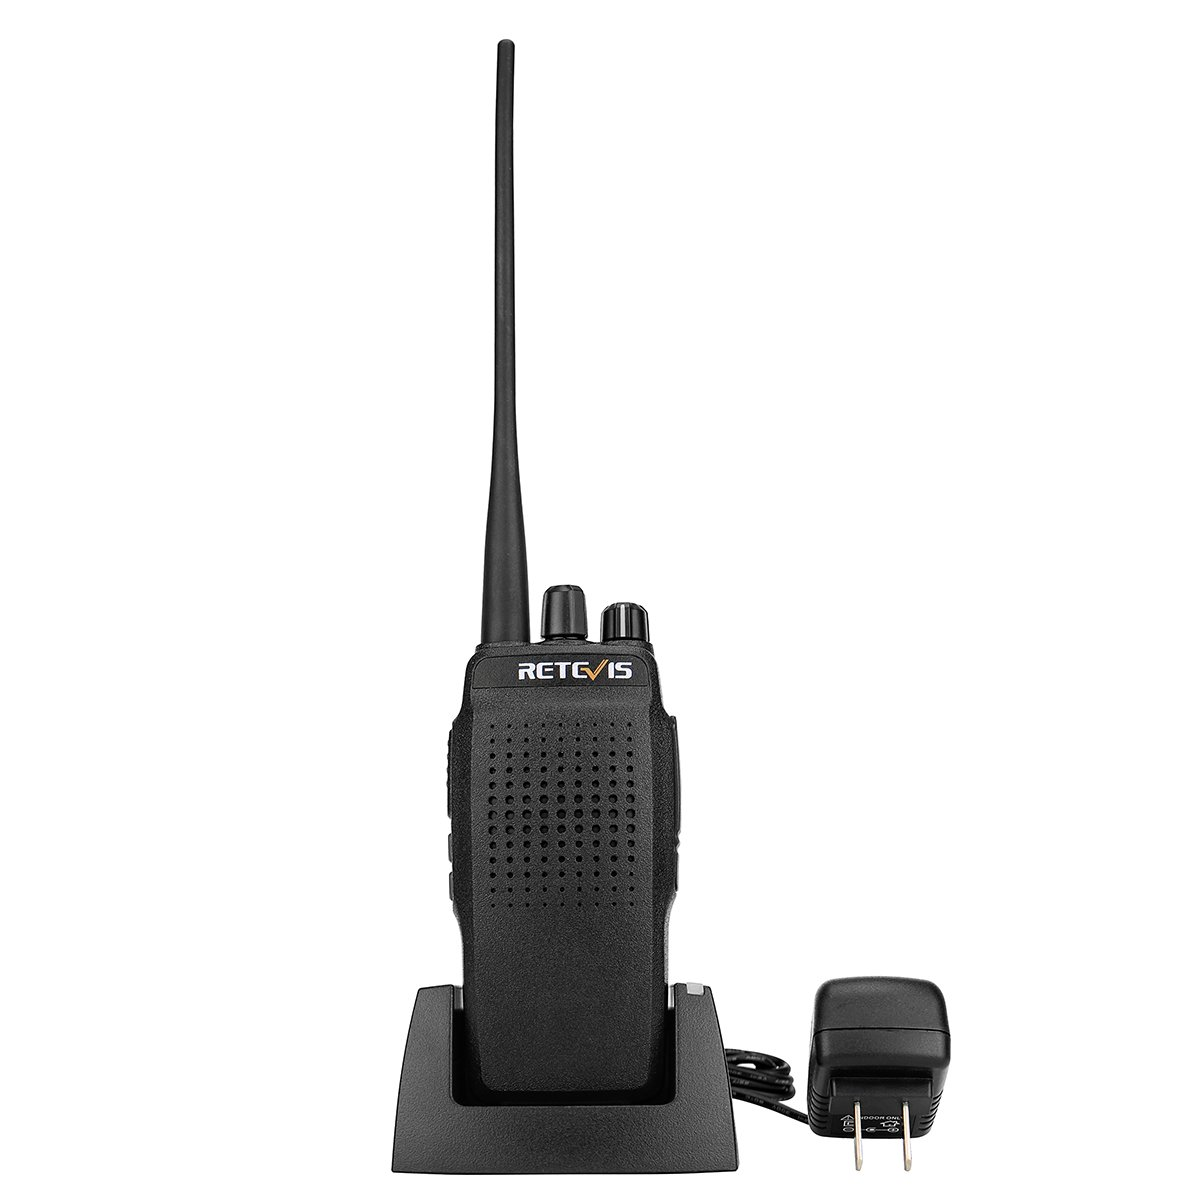 Retevis RT26 Two Way Radio 10W UHF 400-470MHz 3000mAh High Power VOX Scan FM Walkie Talkies